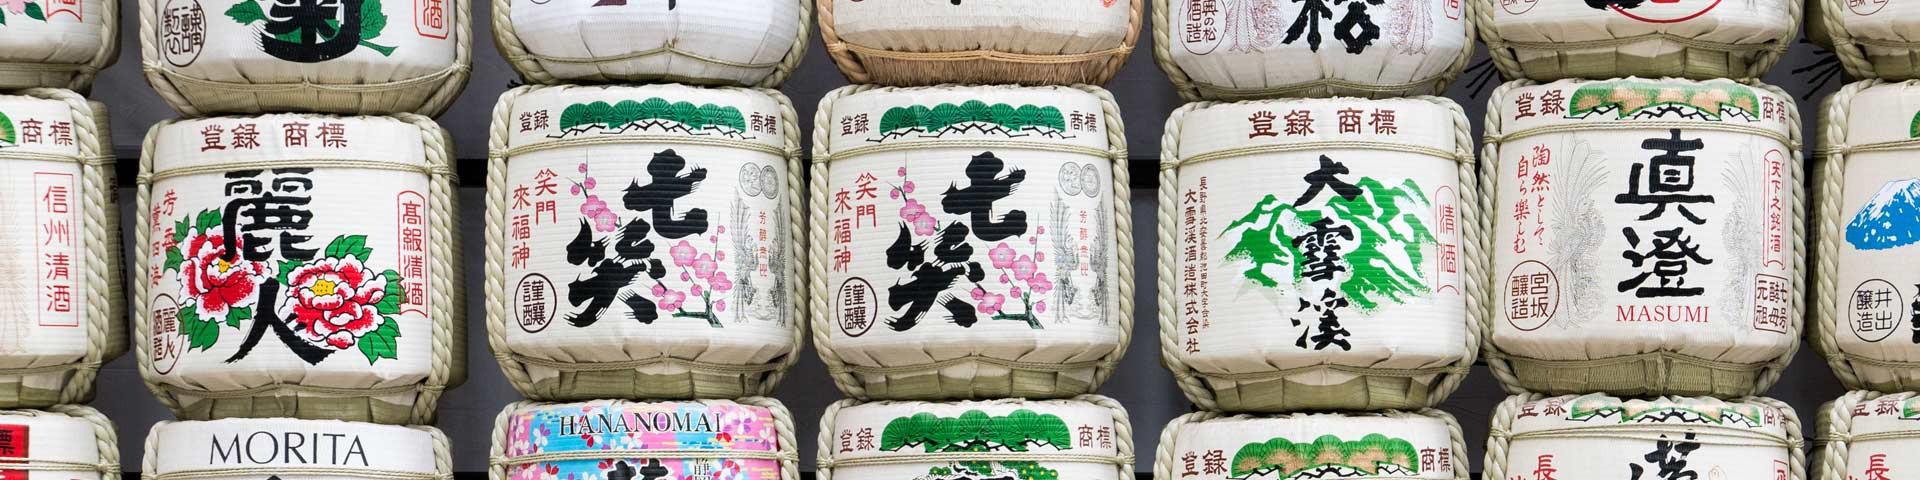 JAPANESE BEVERAGES | TRADITIONAL JAPANESE TEA | MATCHA | SAKE